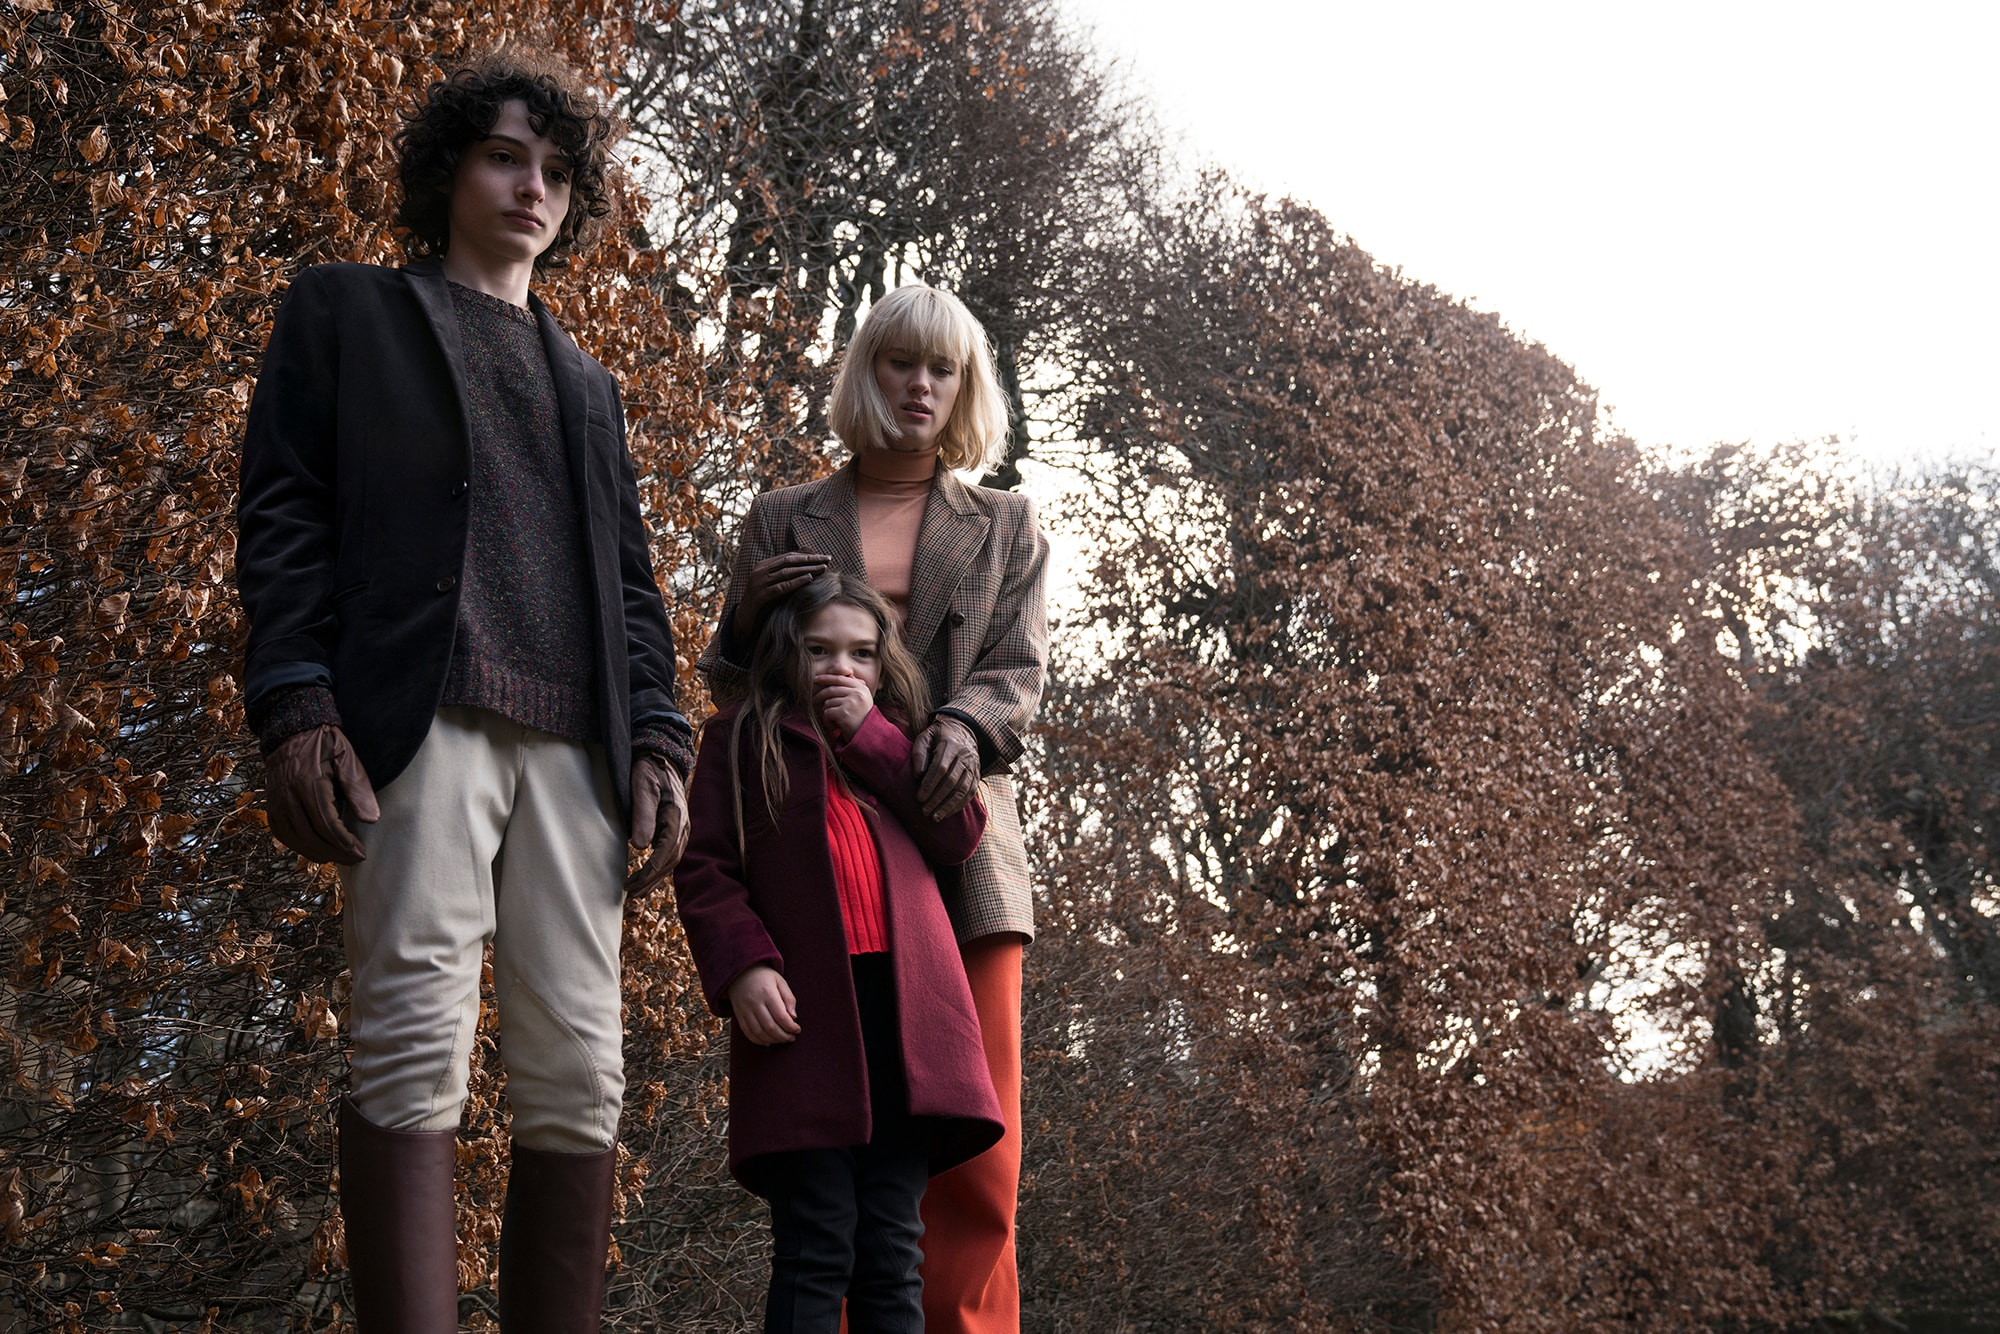 Mackenzie Davis, Finn Wolfhard, and Brooklynn Prince in The Turning (2020 Movie)